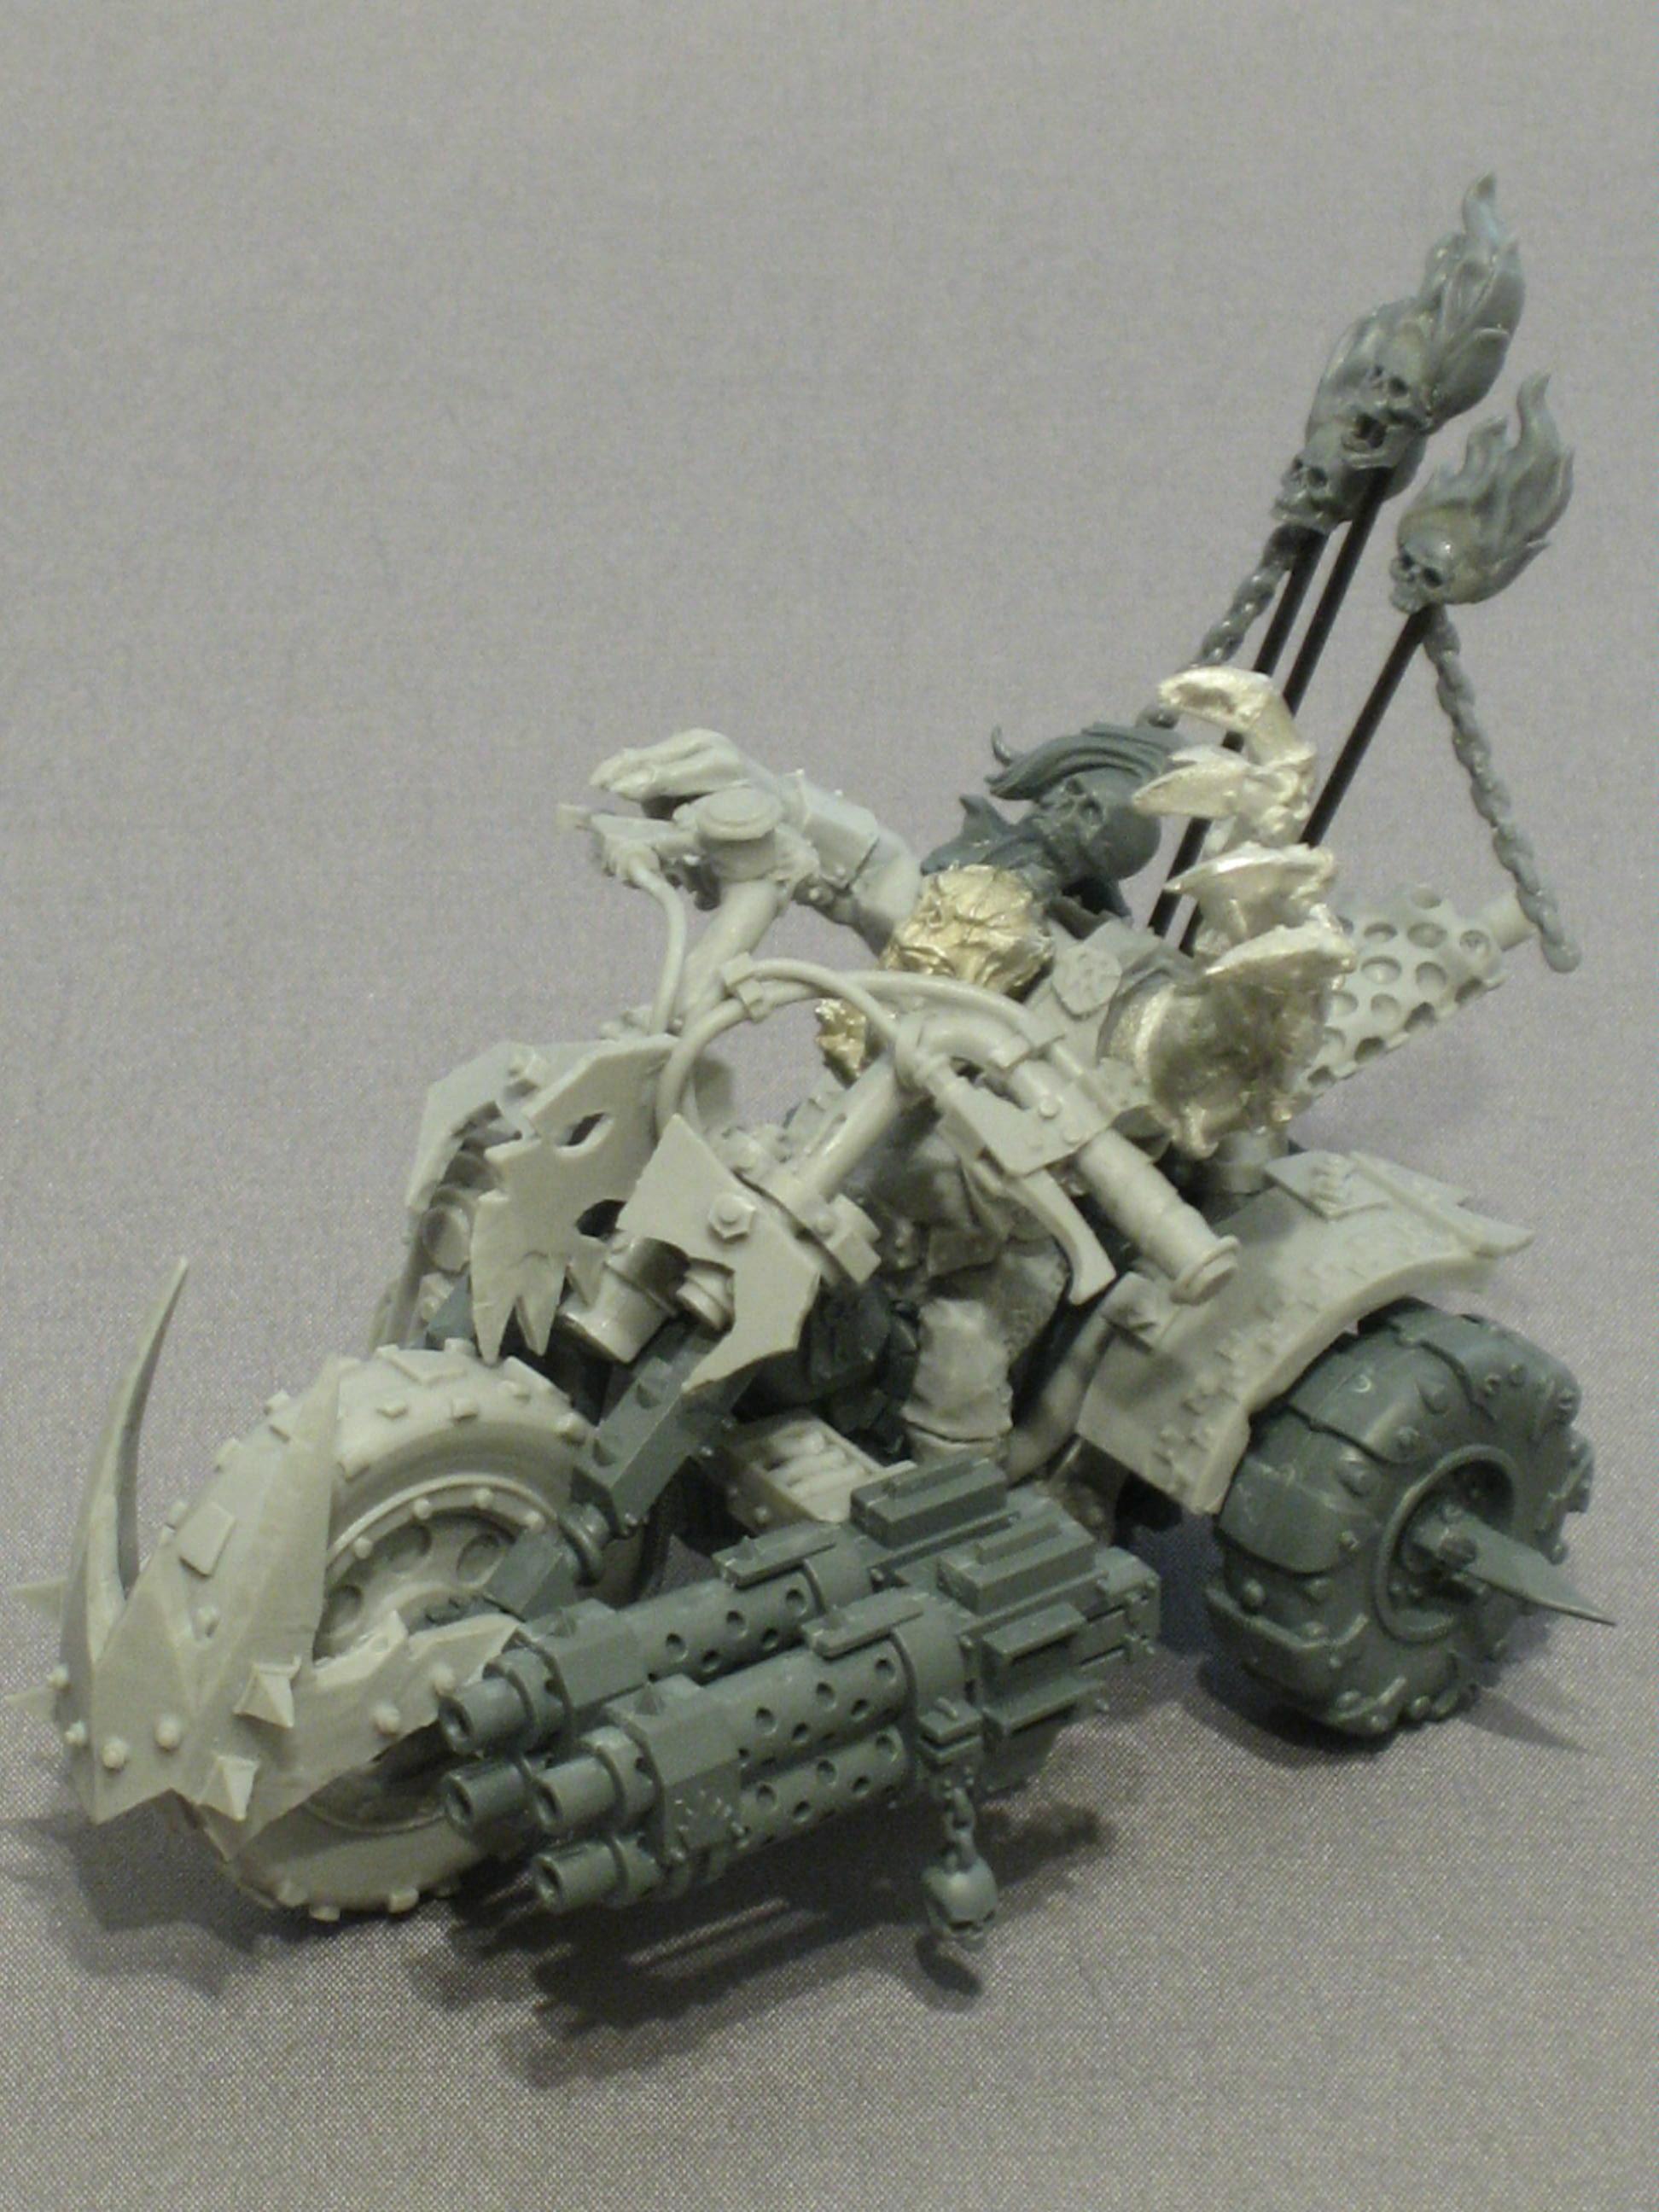 Bike, Orks, Warbike, Wazdakka Gutsmek